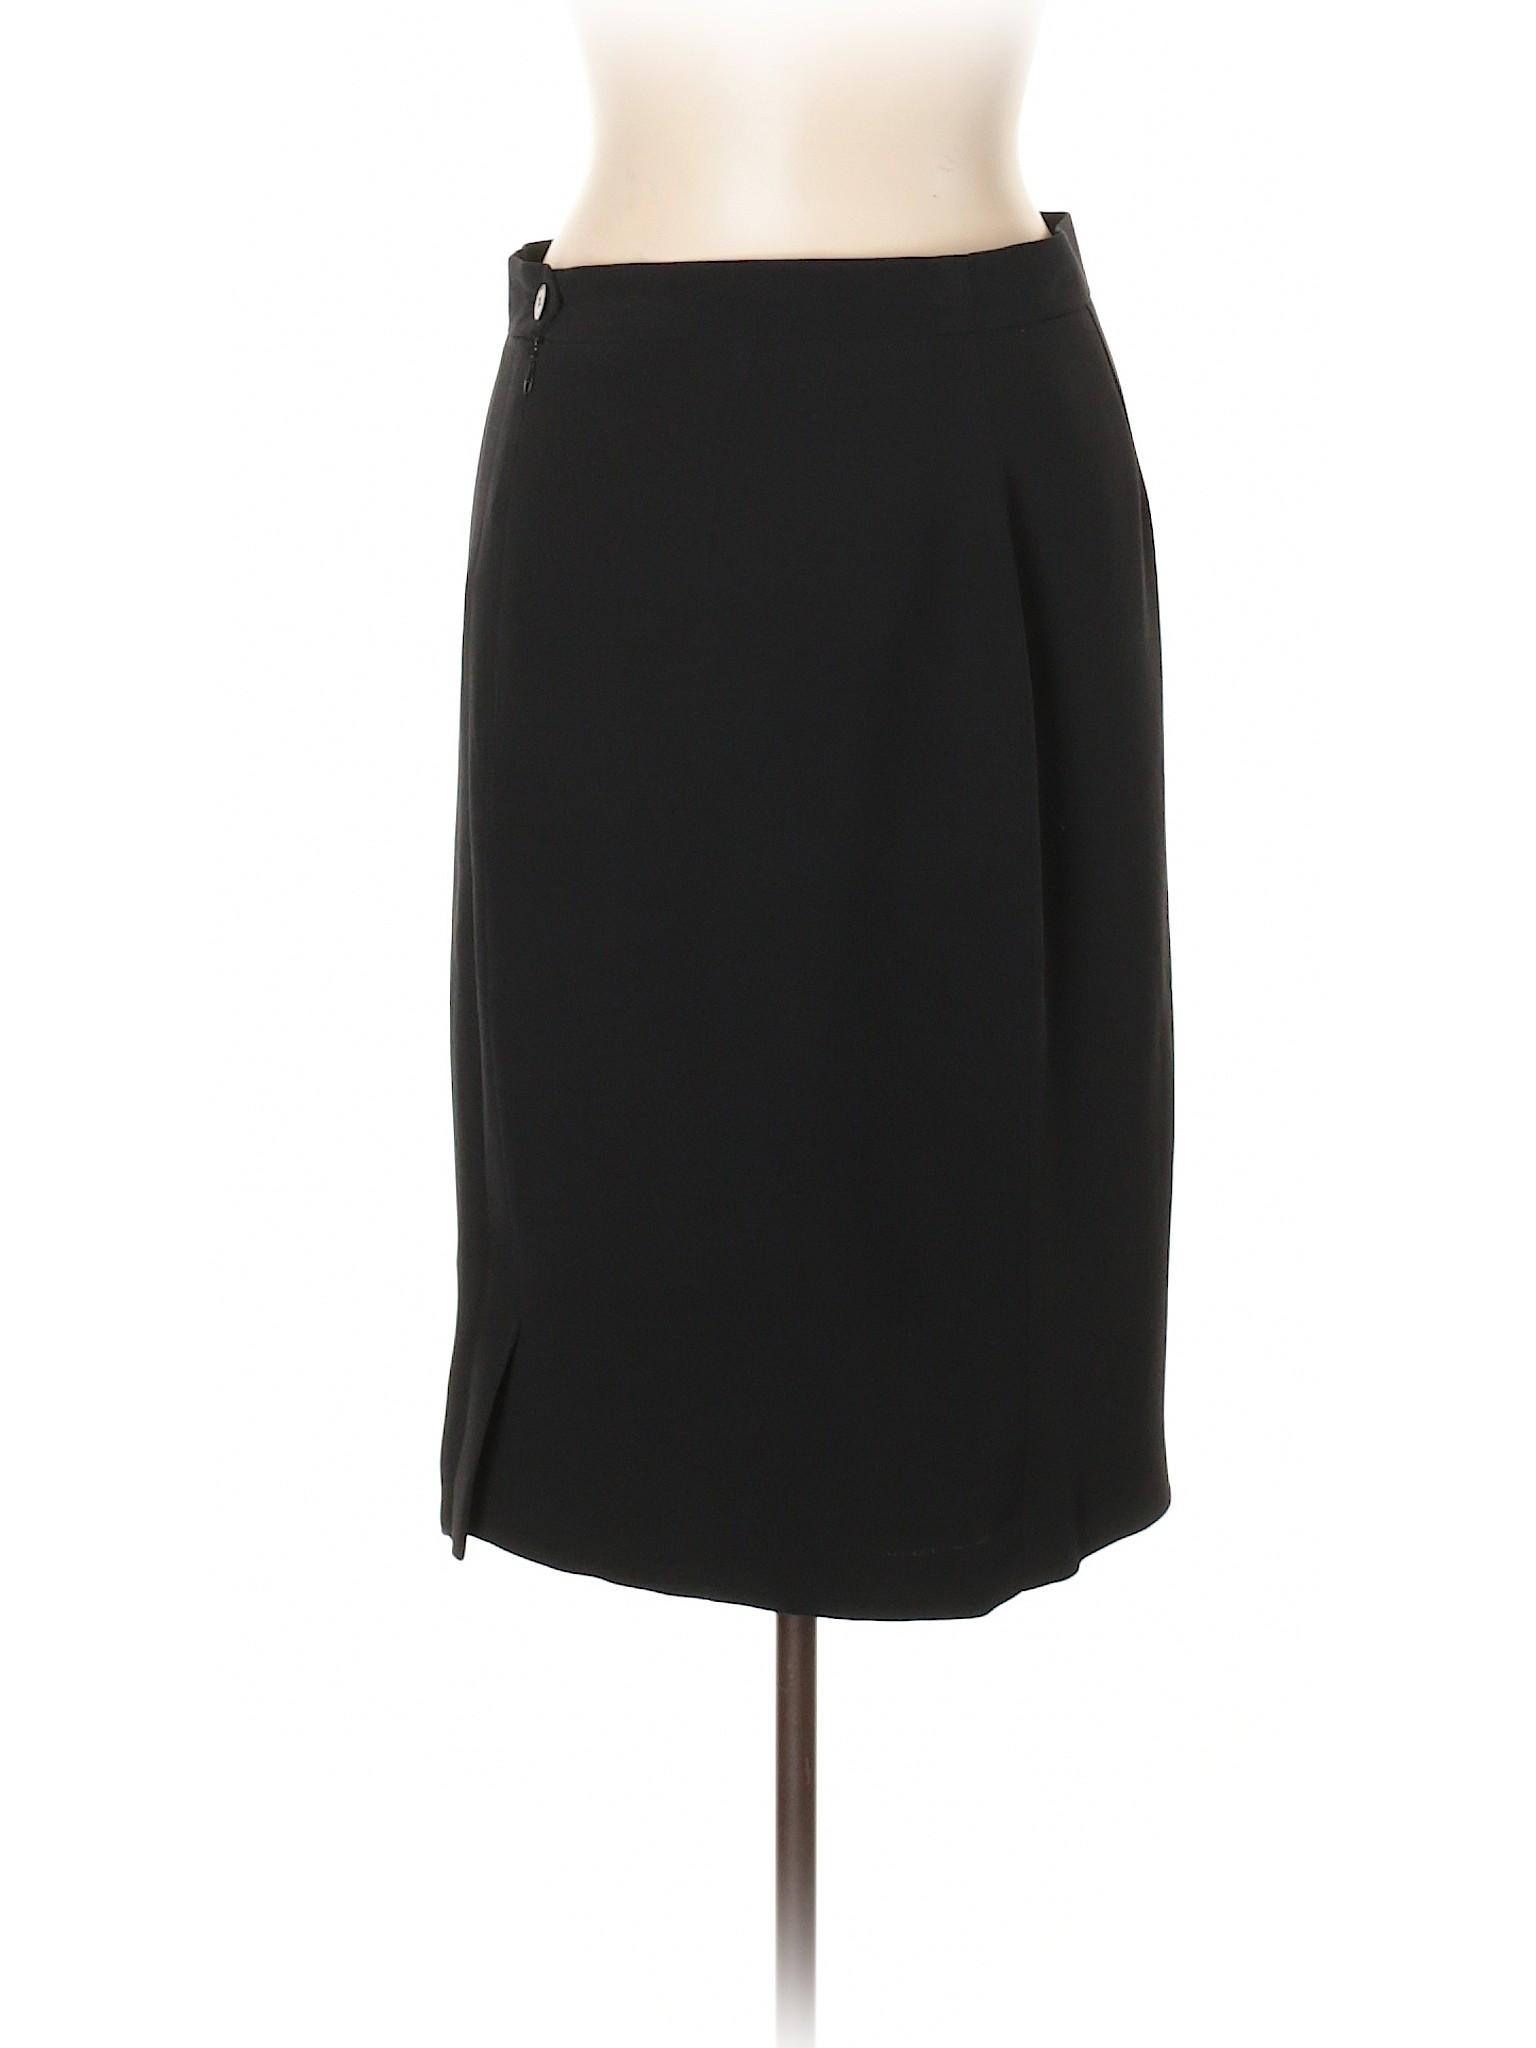 Skirt Boutique Boutique Skirt Skirt Boutique Silk Boutique Skirt Silk Silk Silk Silk Boutique 1qawa